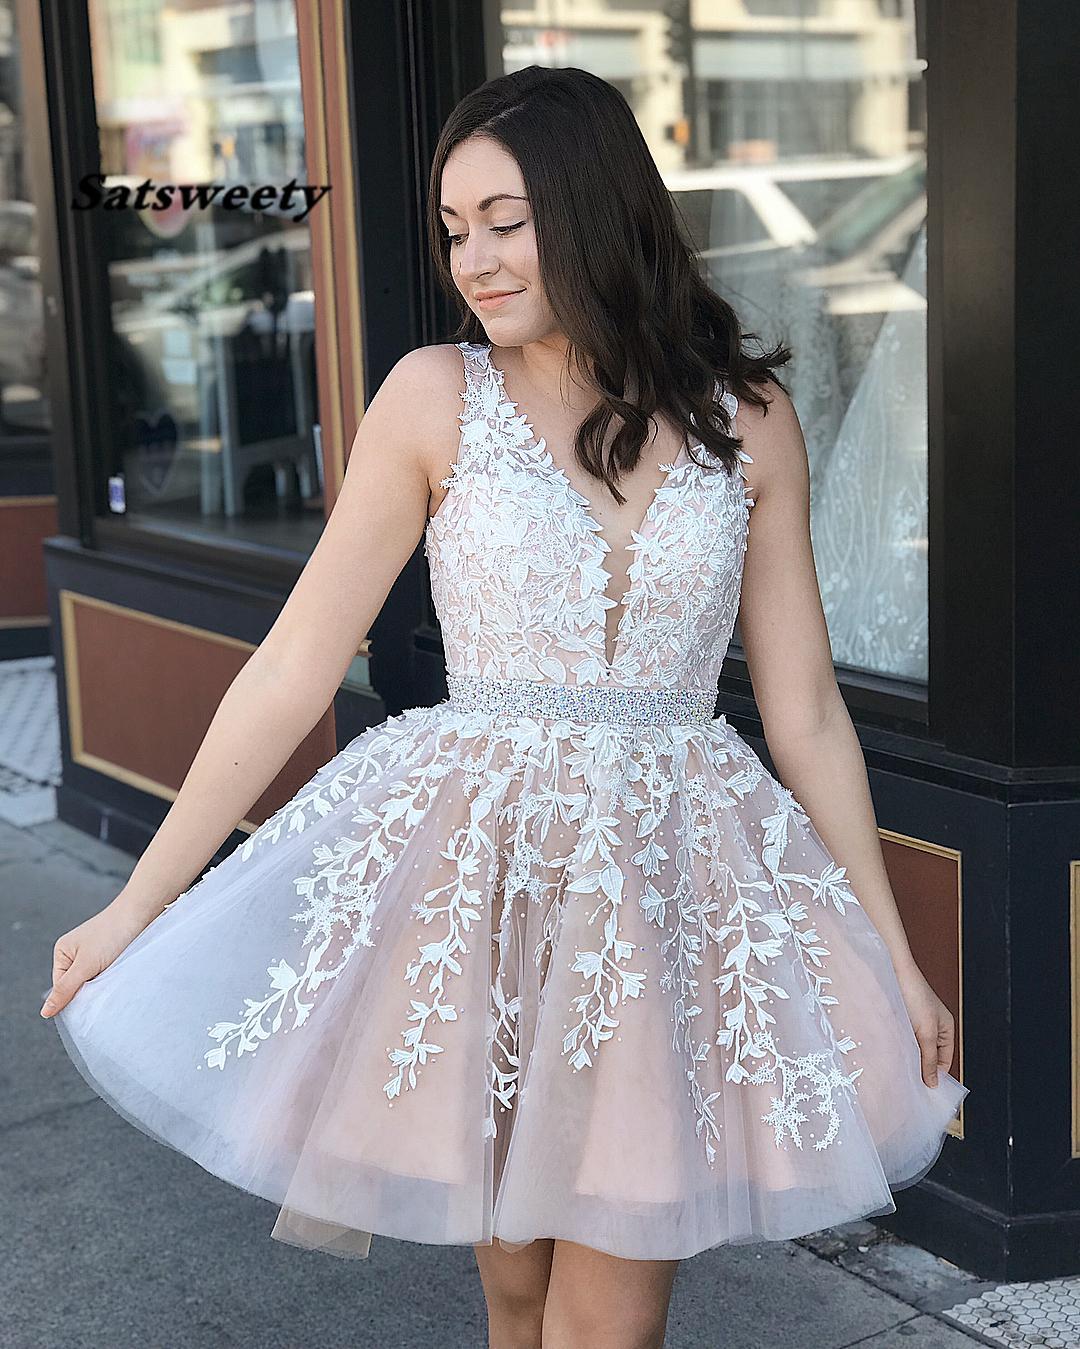 vestidos de cóctel Short Homecoming Dresses V Neck A line Lace Appliques vestido curto Crystals Cocktail Party Gowns Open Back